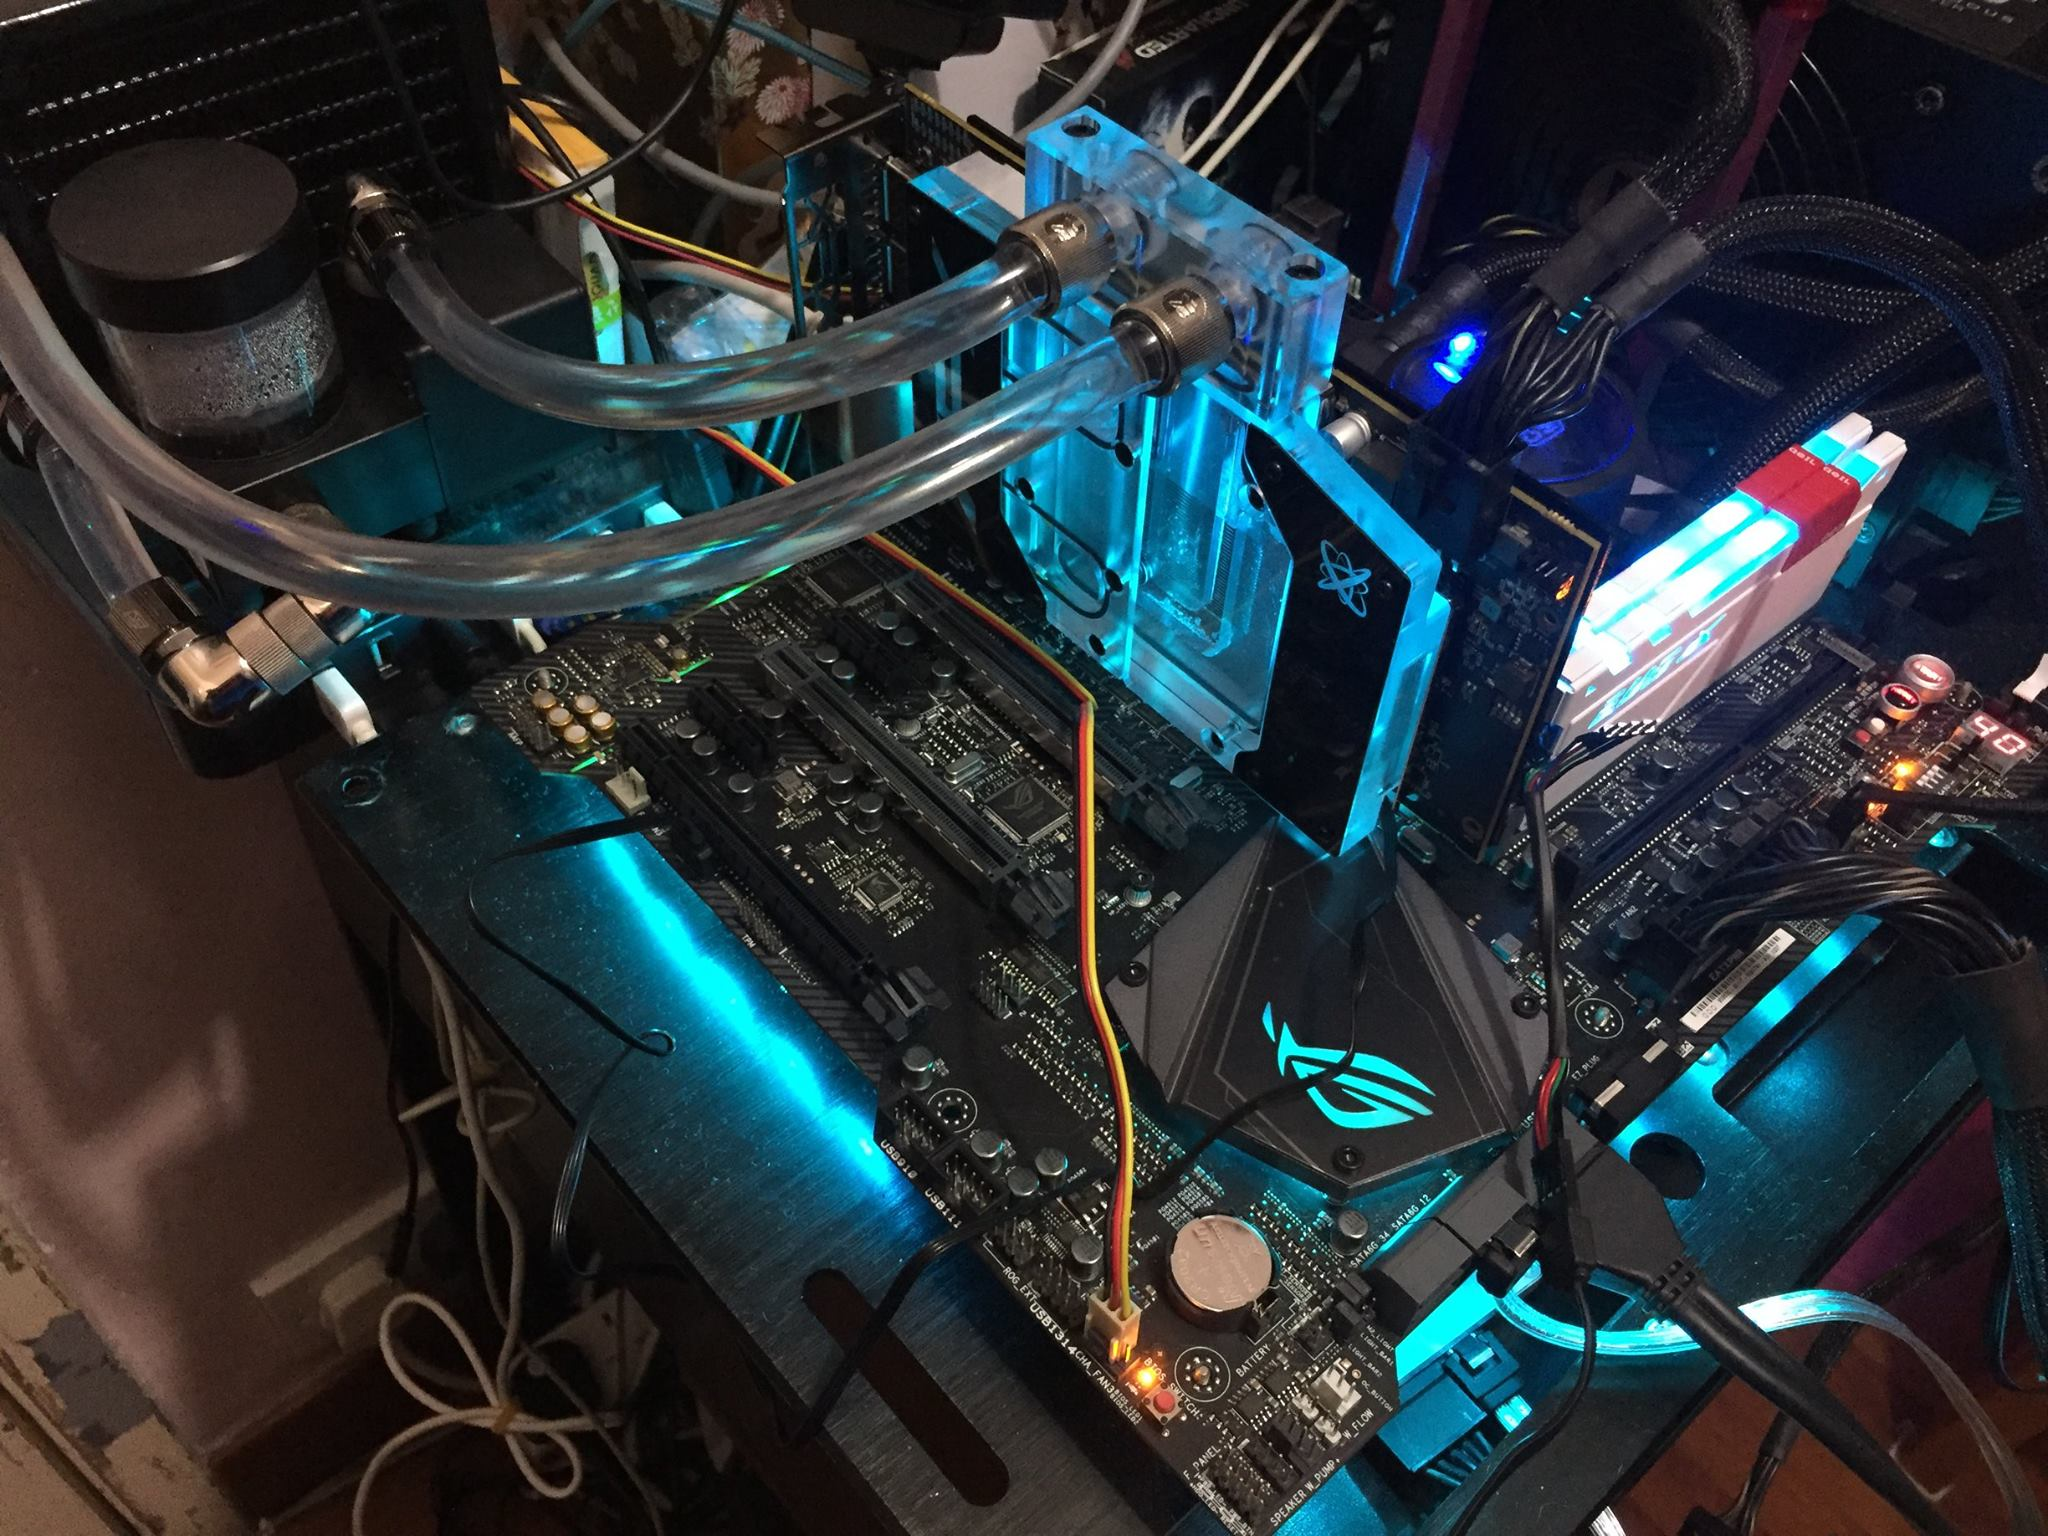 Amd Radeon Rx 580 First Benchmarks And Overclocking Videocardz Com